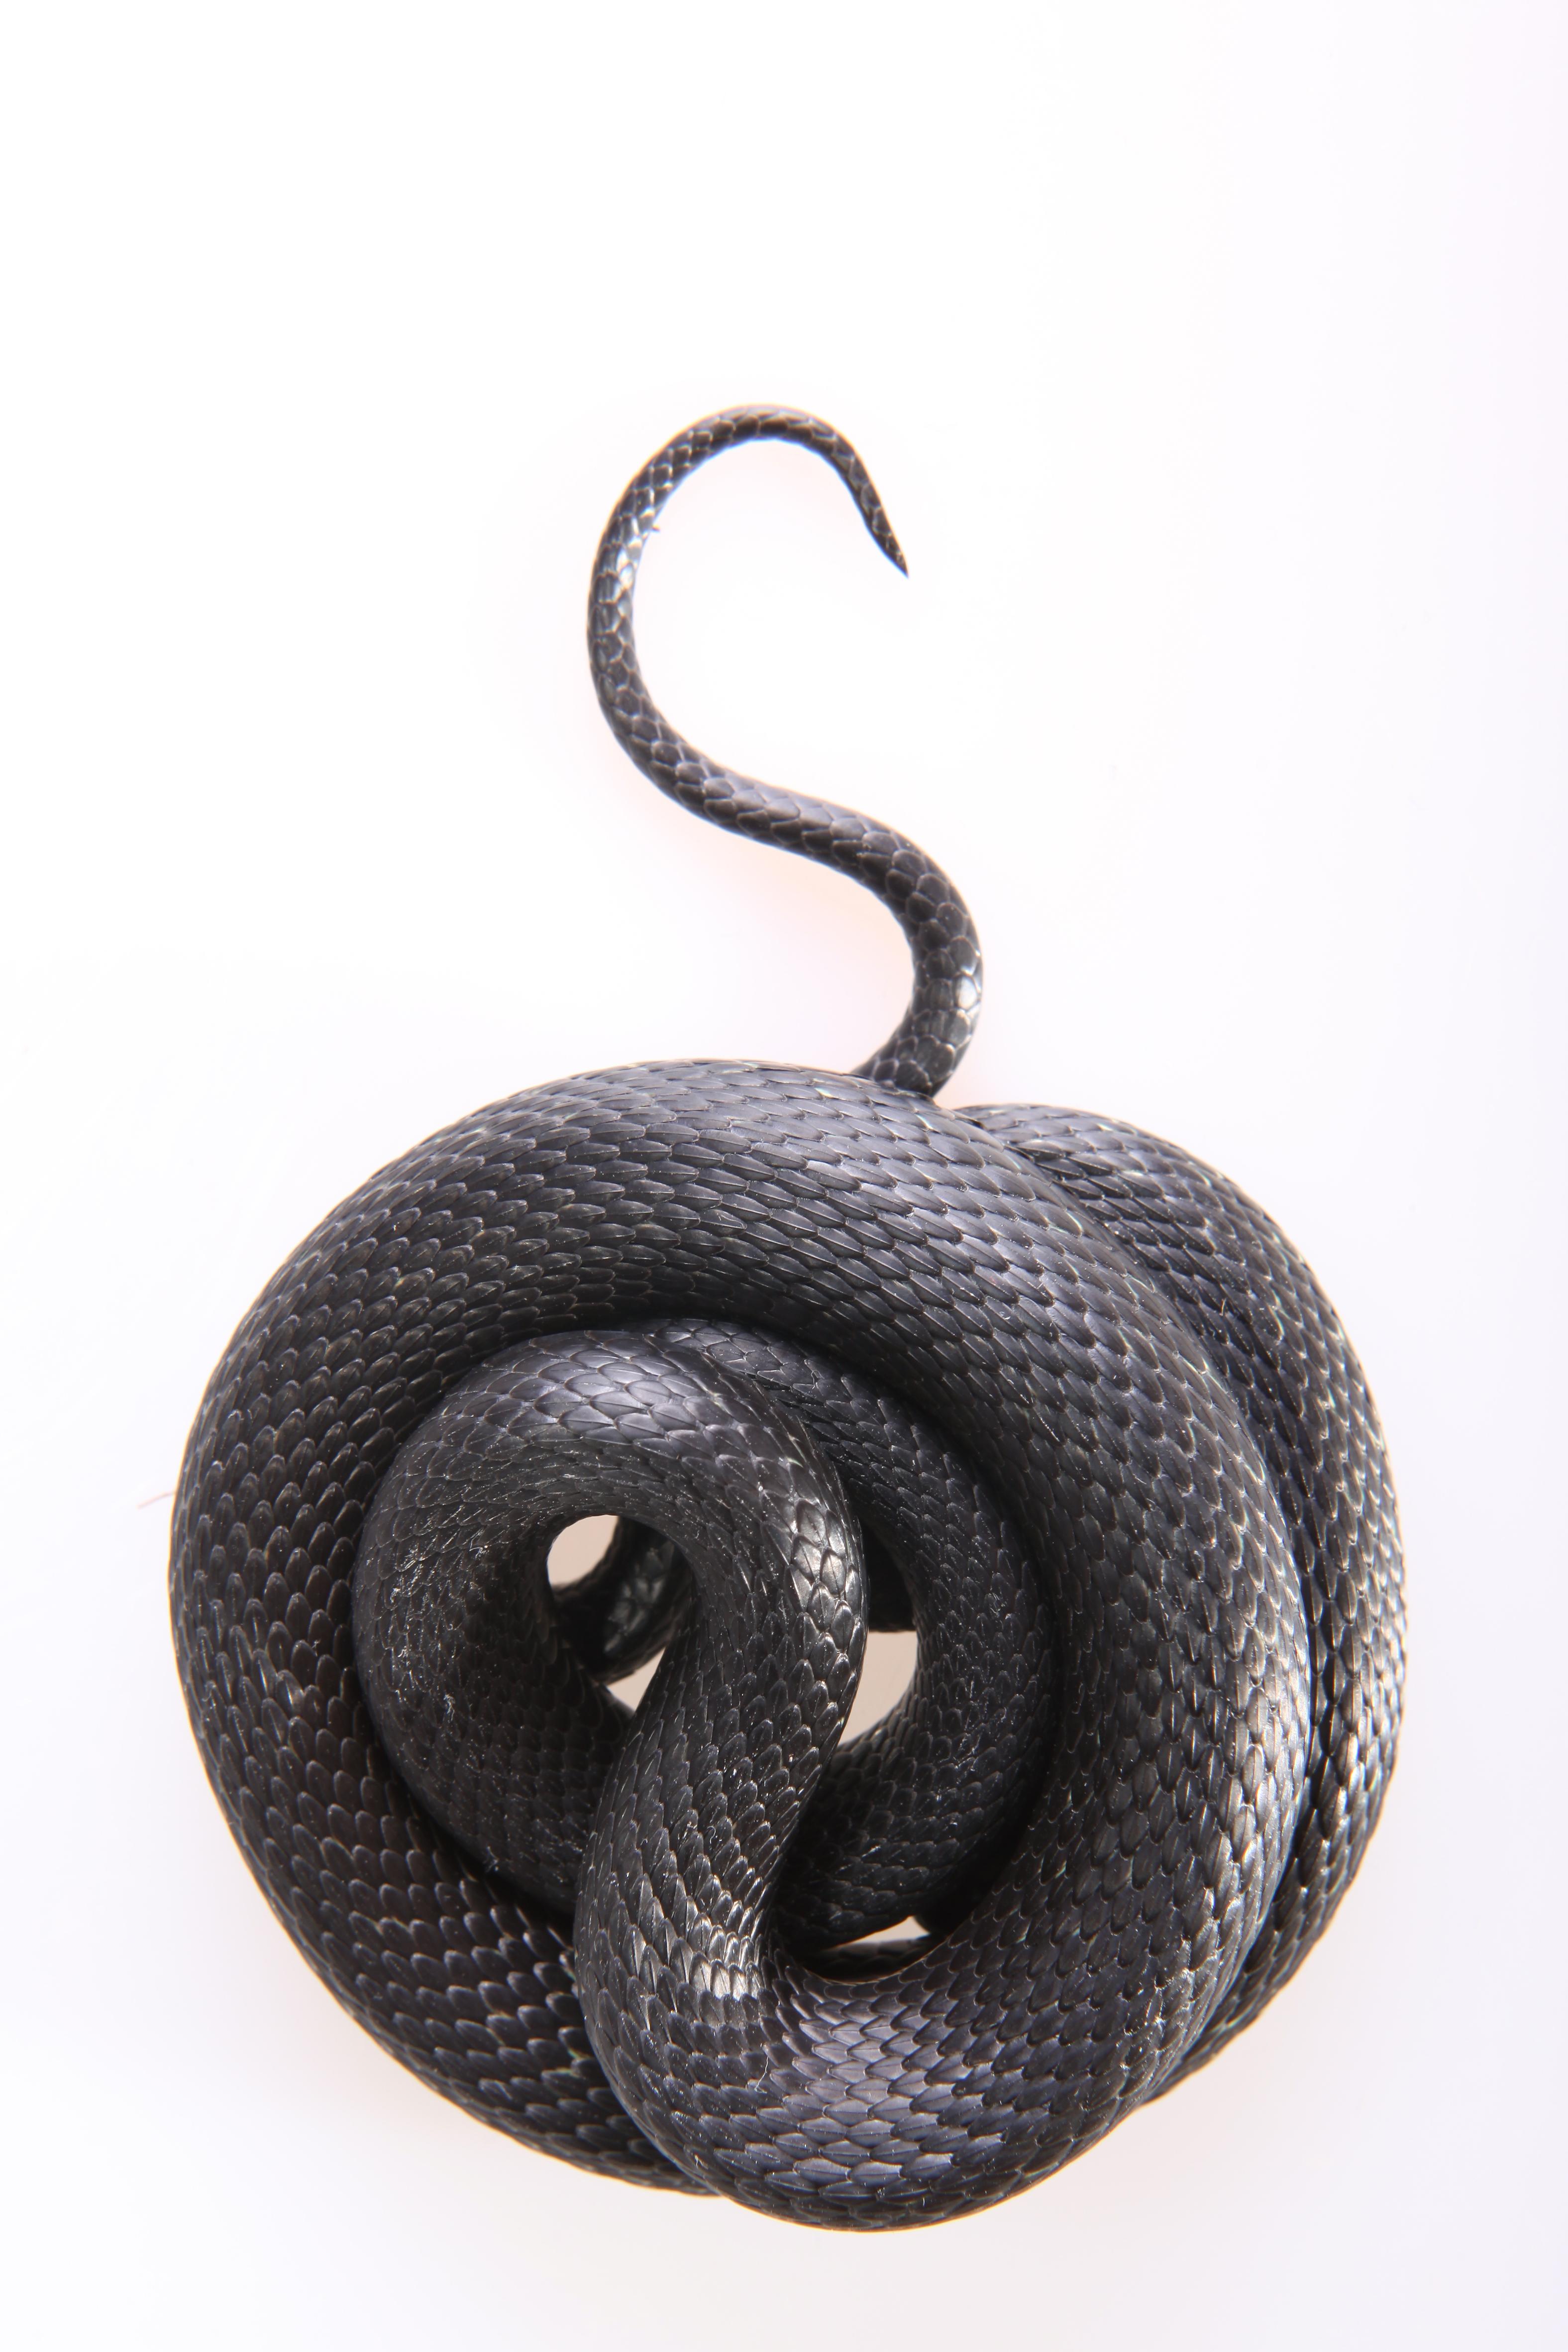 Grass-snake, Animal, Nature, Tongue, Threats, HQ Photo